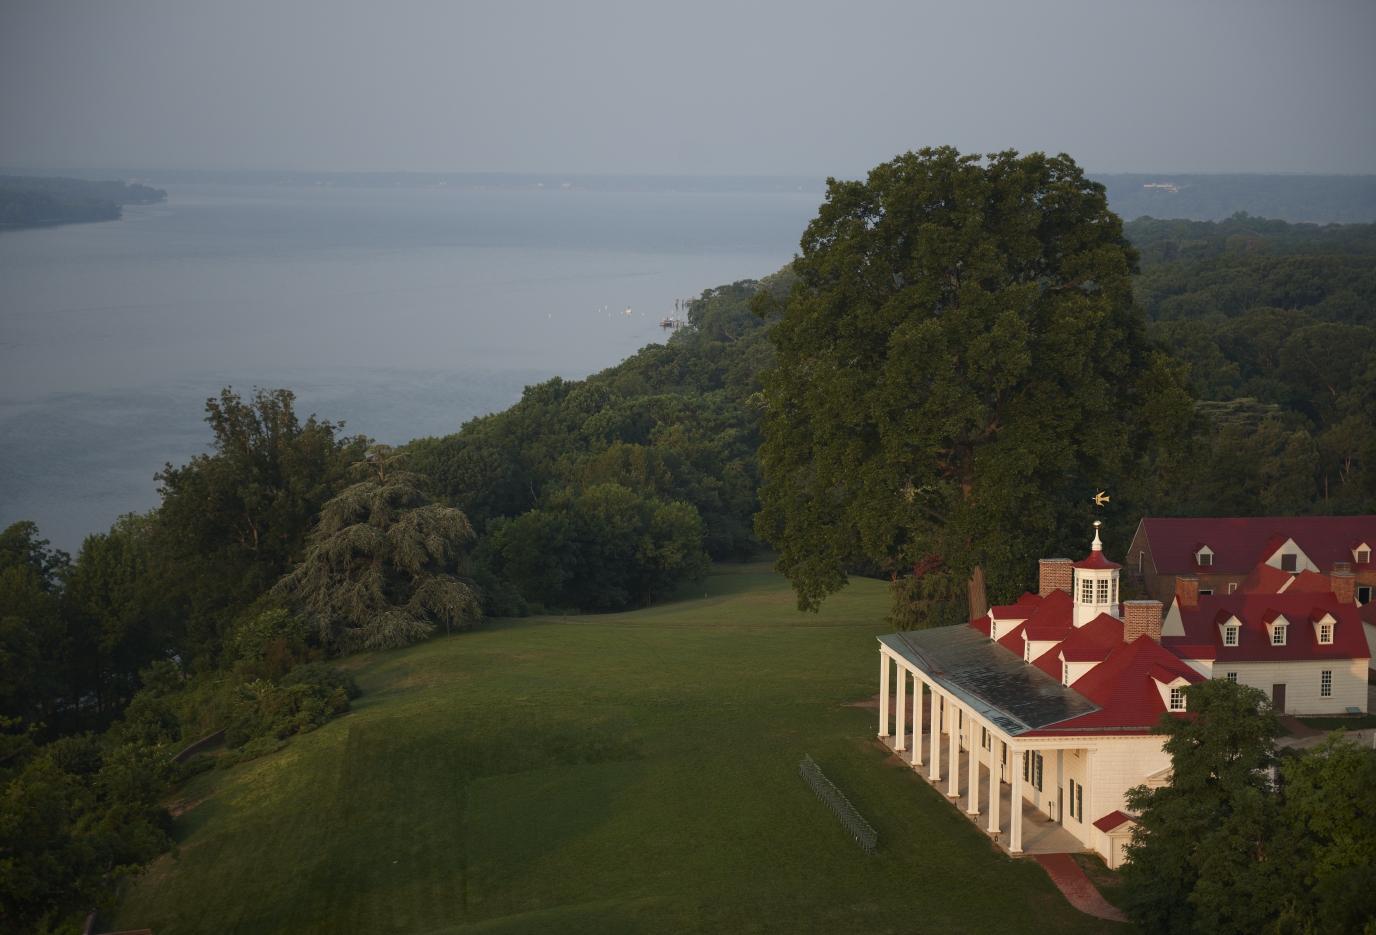 Mount Vernon, George Washington's Estate and Garden, overlooks the Potomac River.